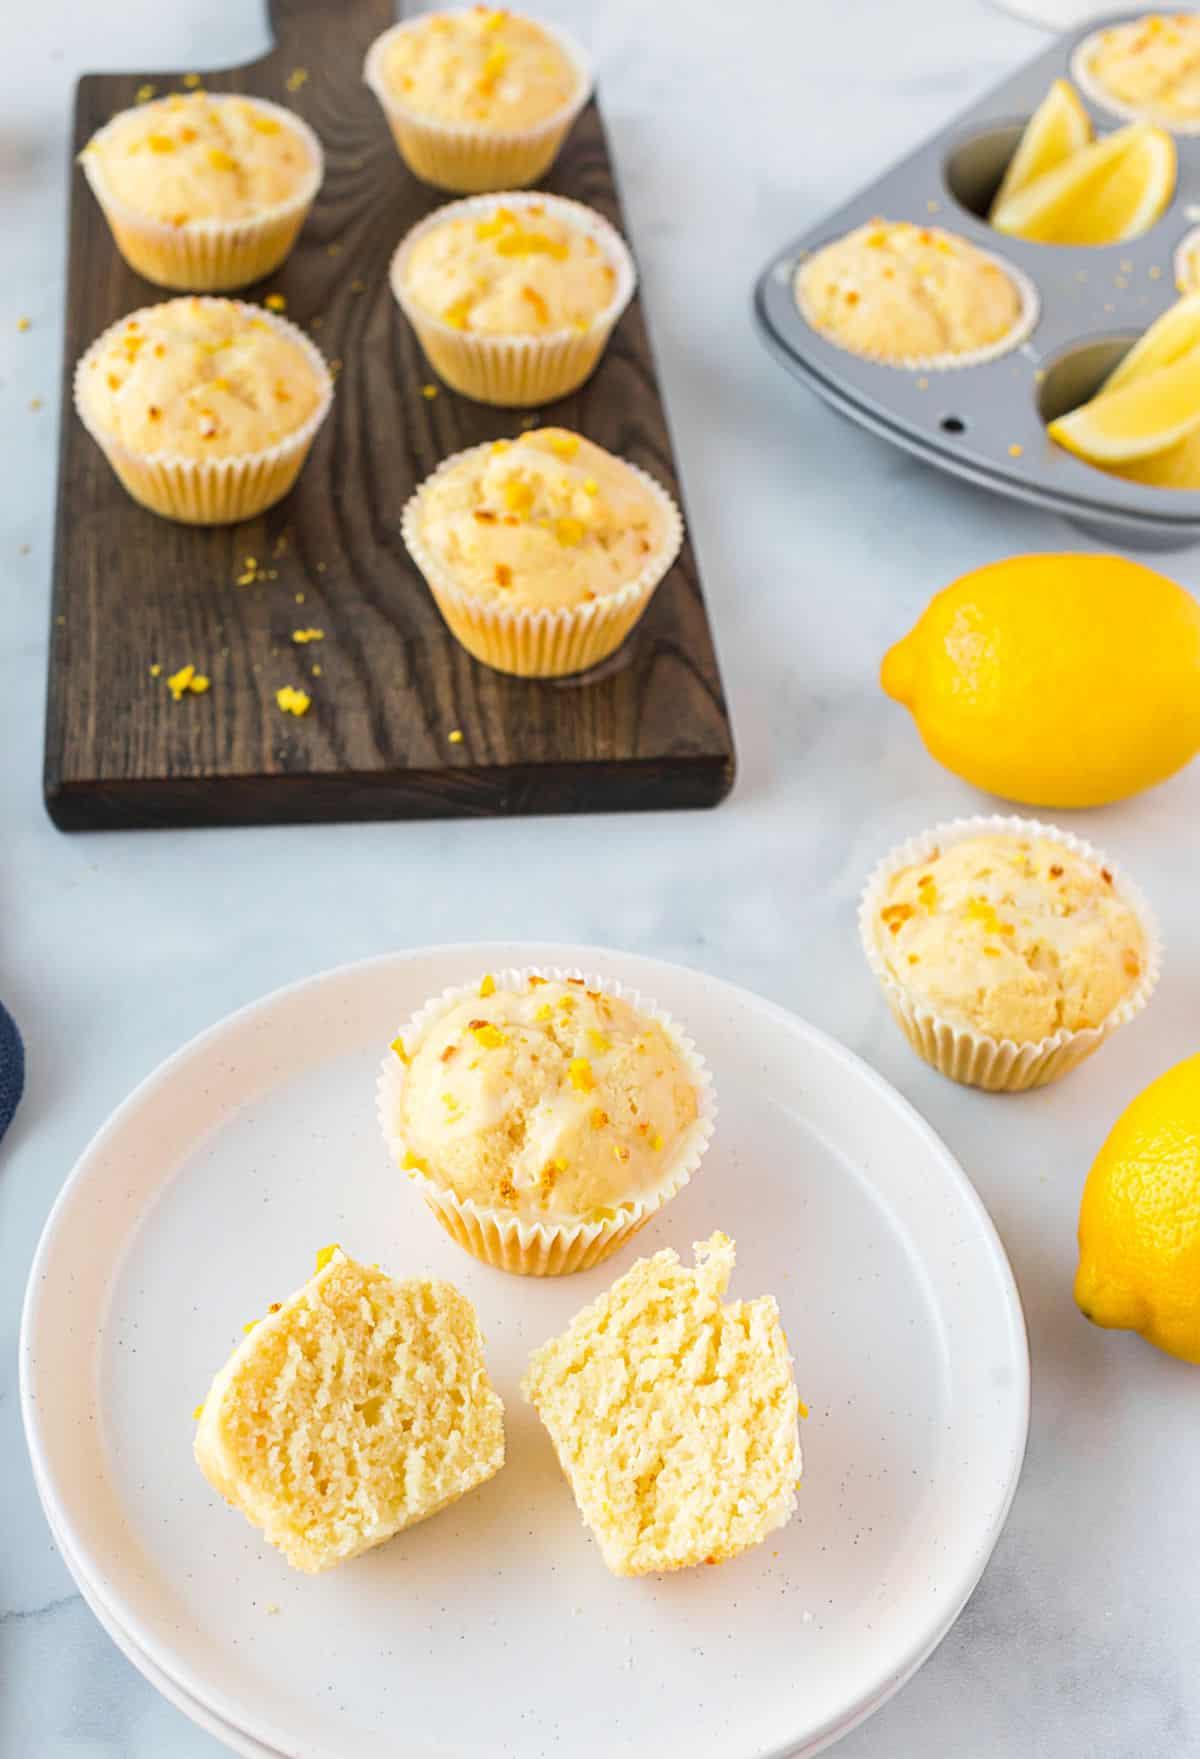 Cut open lemon muffins on a white plate.